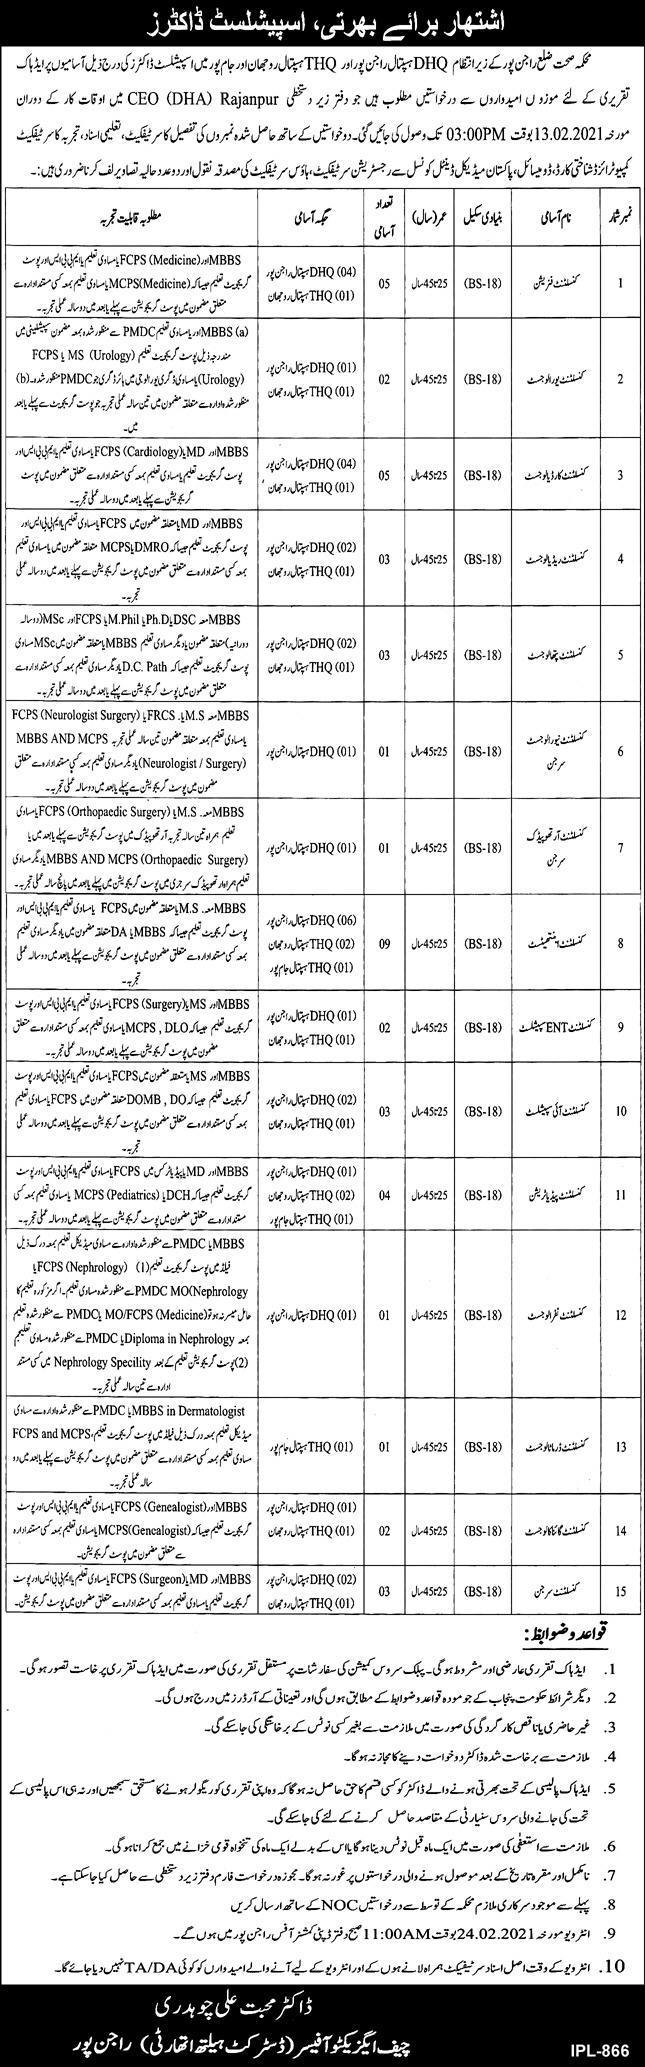 District Health Authority Rajan Pur Jobs